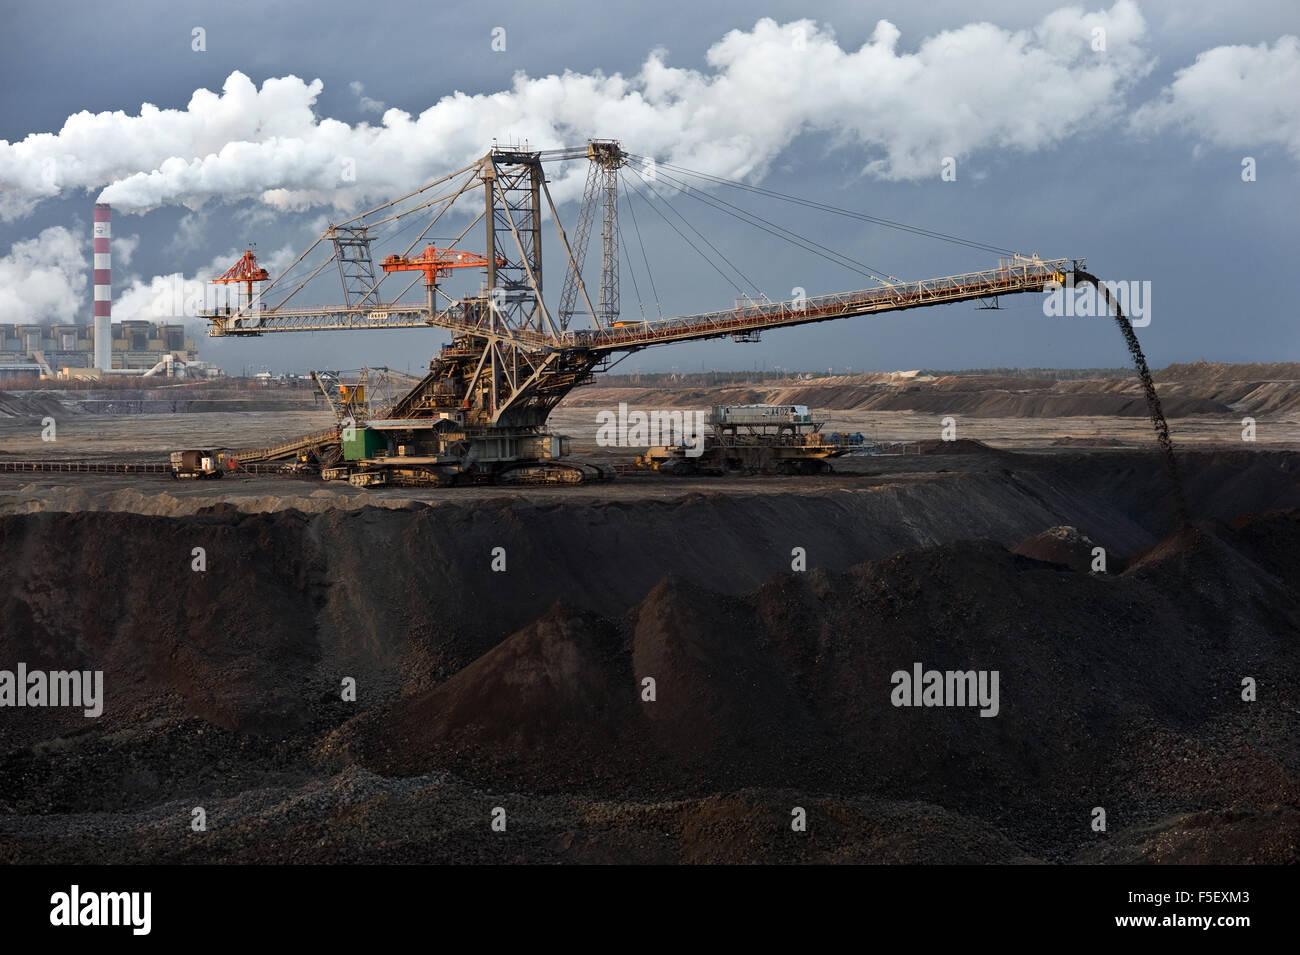 Industrial machine (spreader) at work in Belchatow open-pit coal mine. - Stock Image